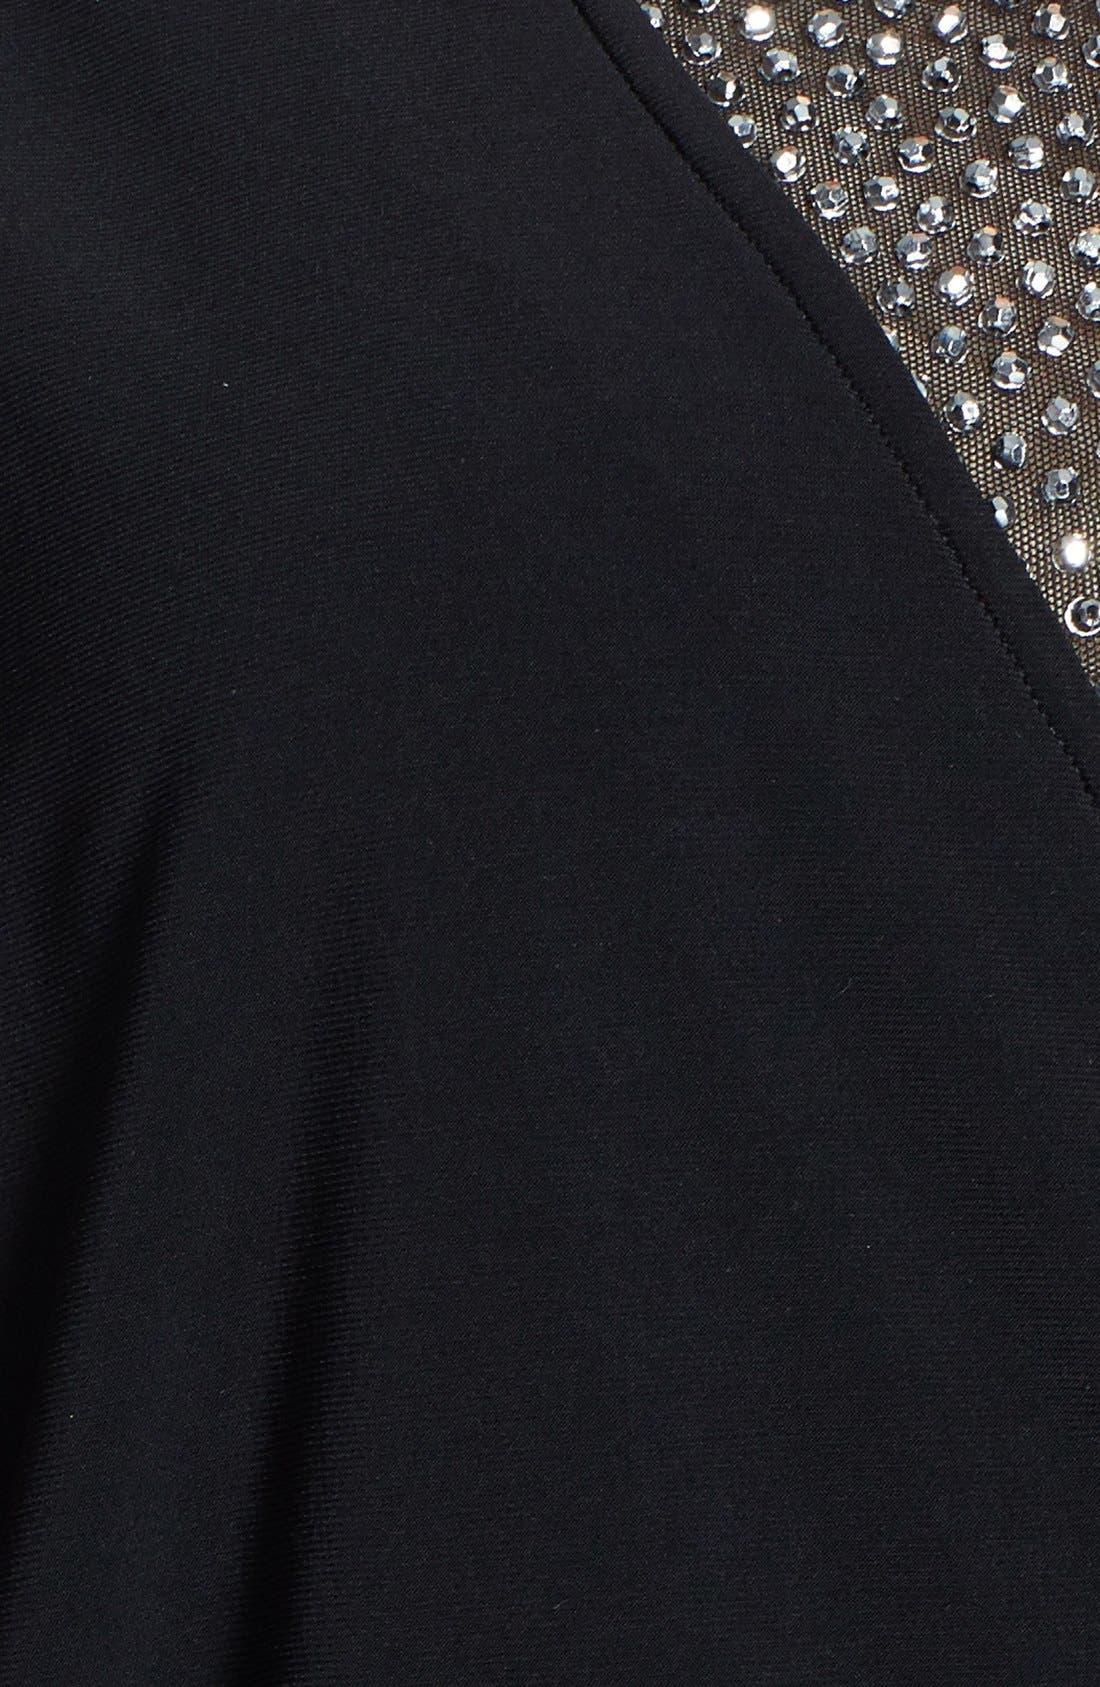 Alternate Image 3  - Xscape Embellished Inset Blouson Jumpsuit (Plus Size)